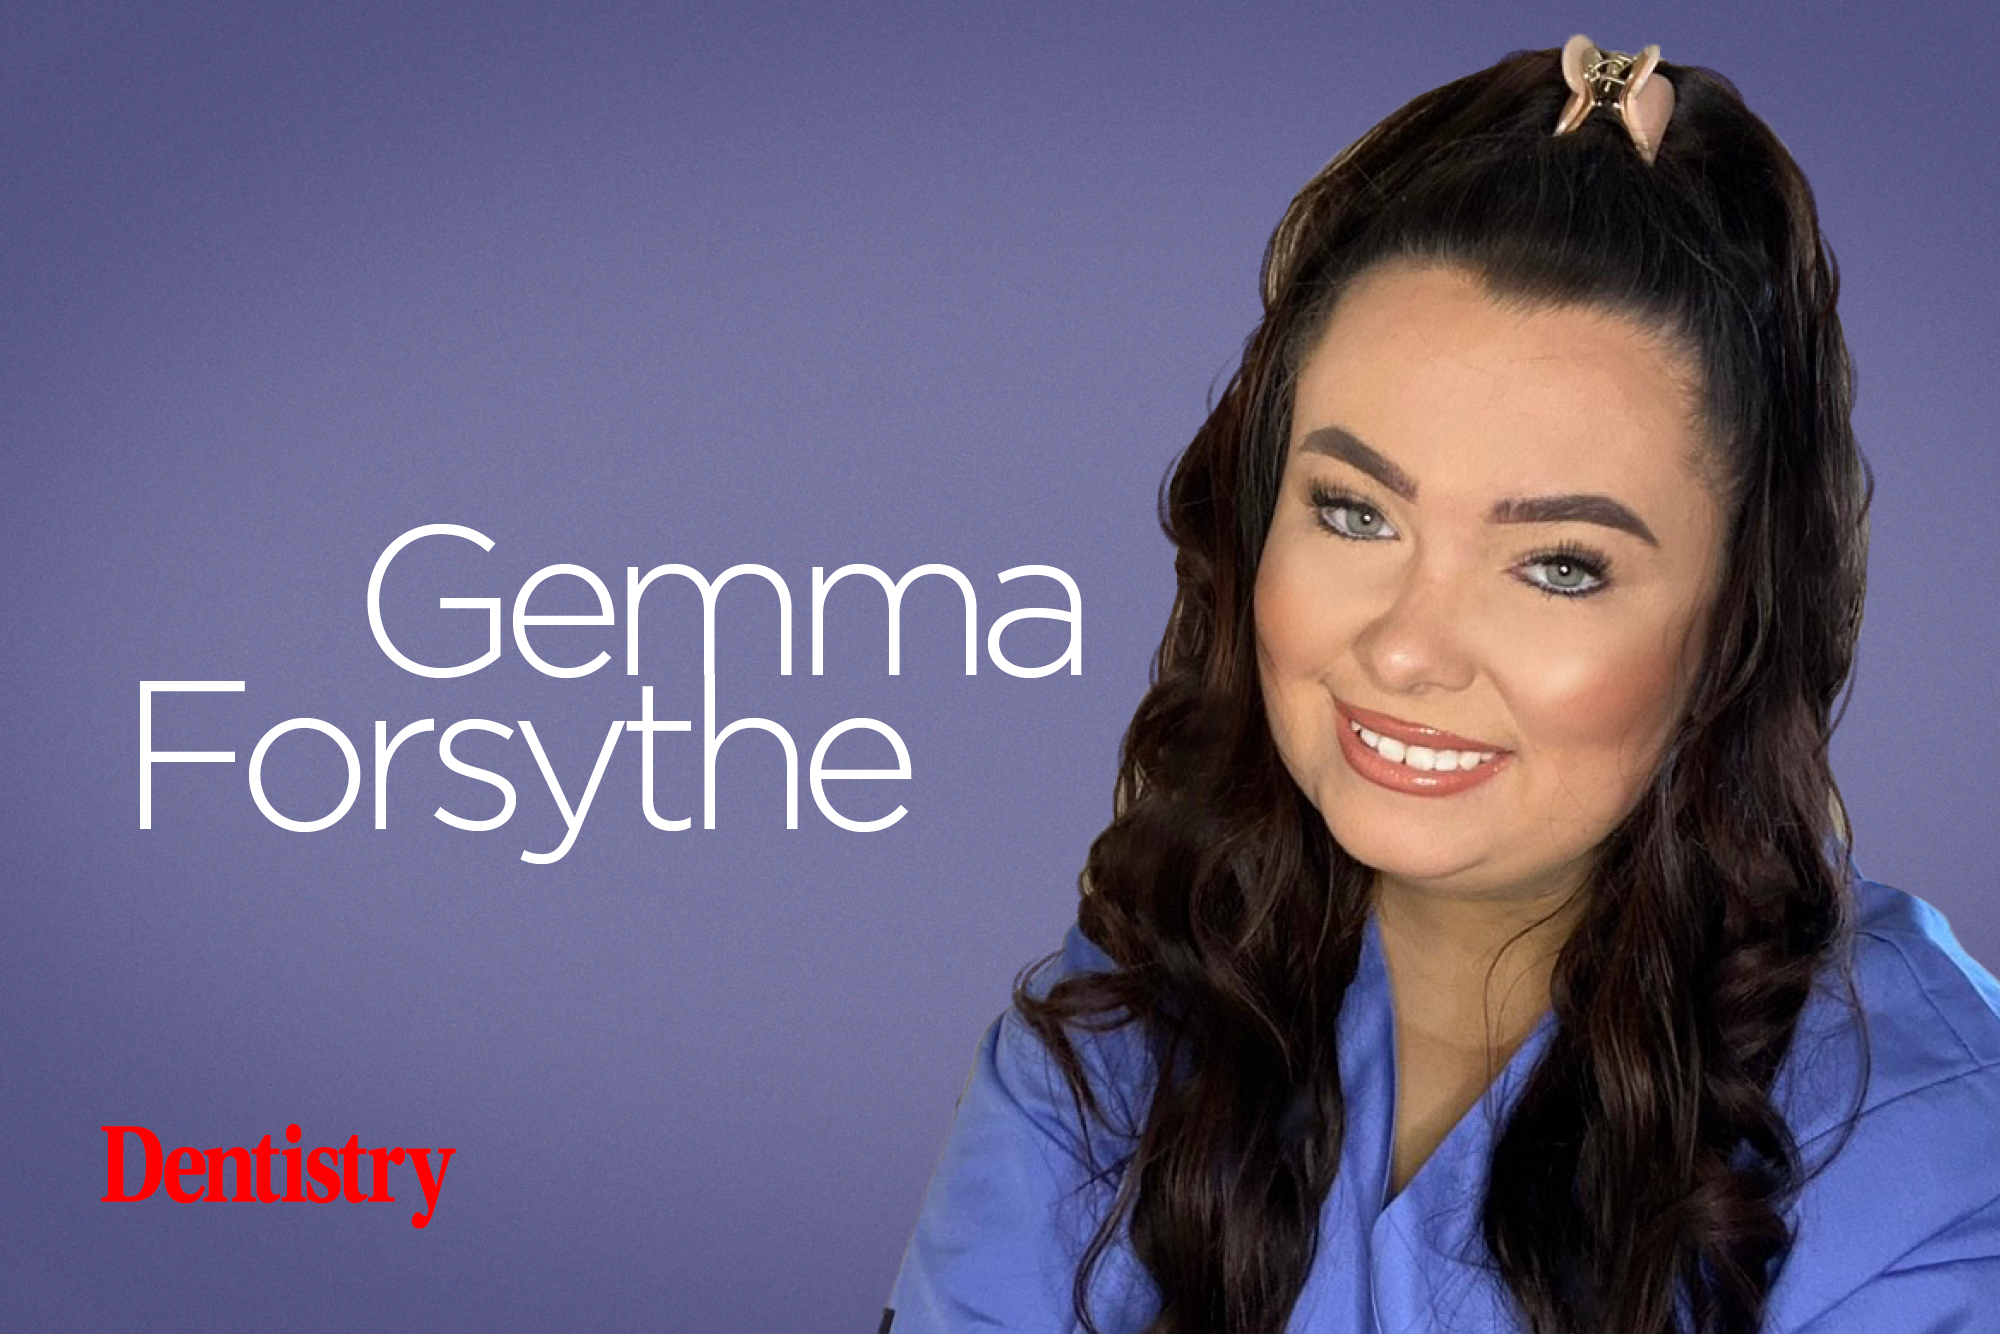 Dentistry podcast – Gemma Forsythe on giving a voice to dental nurses